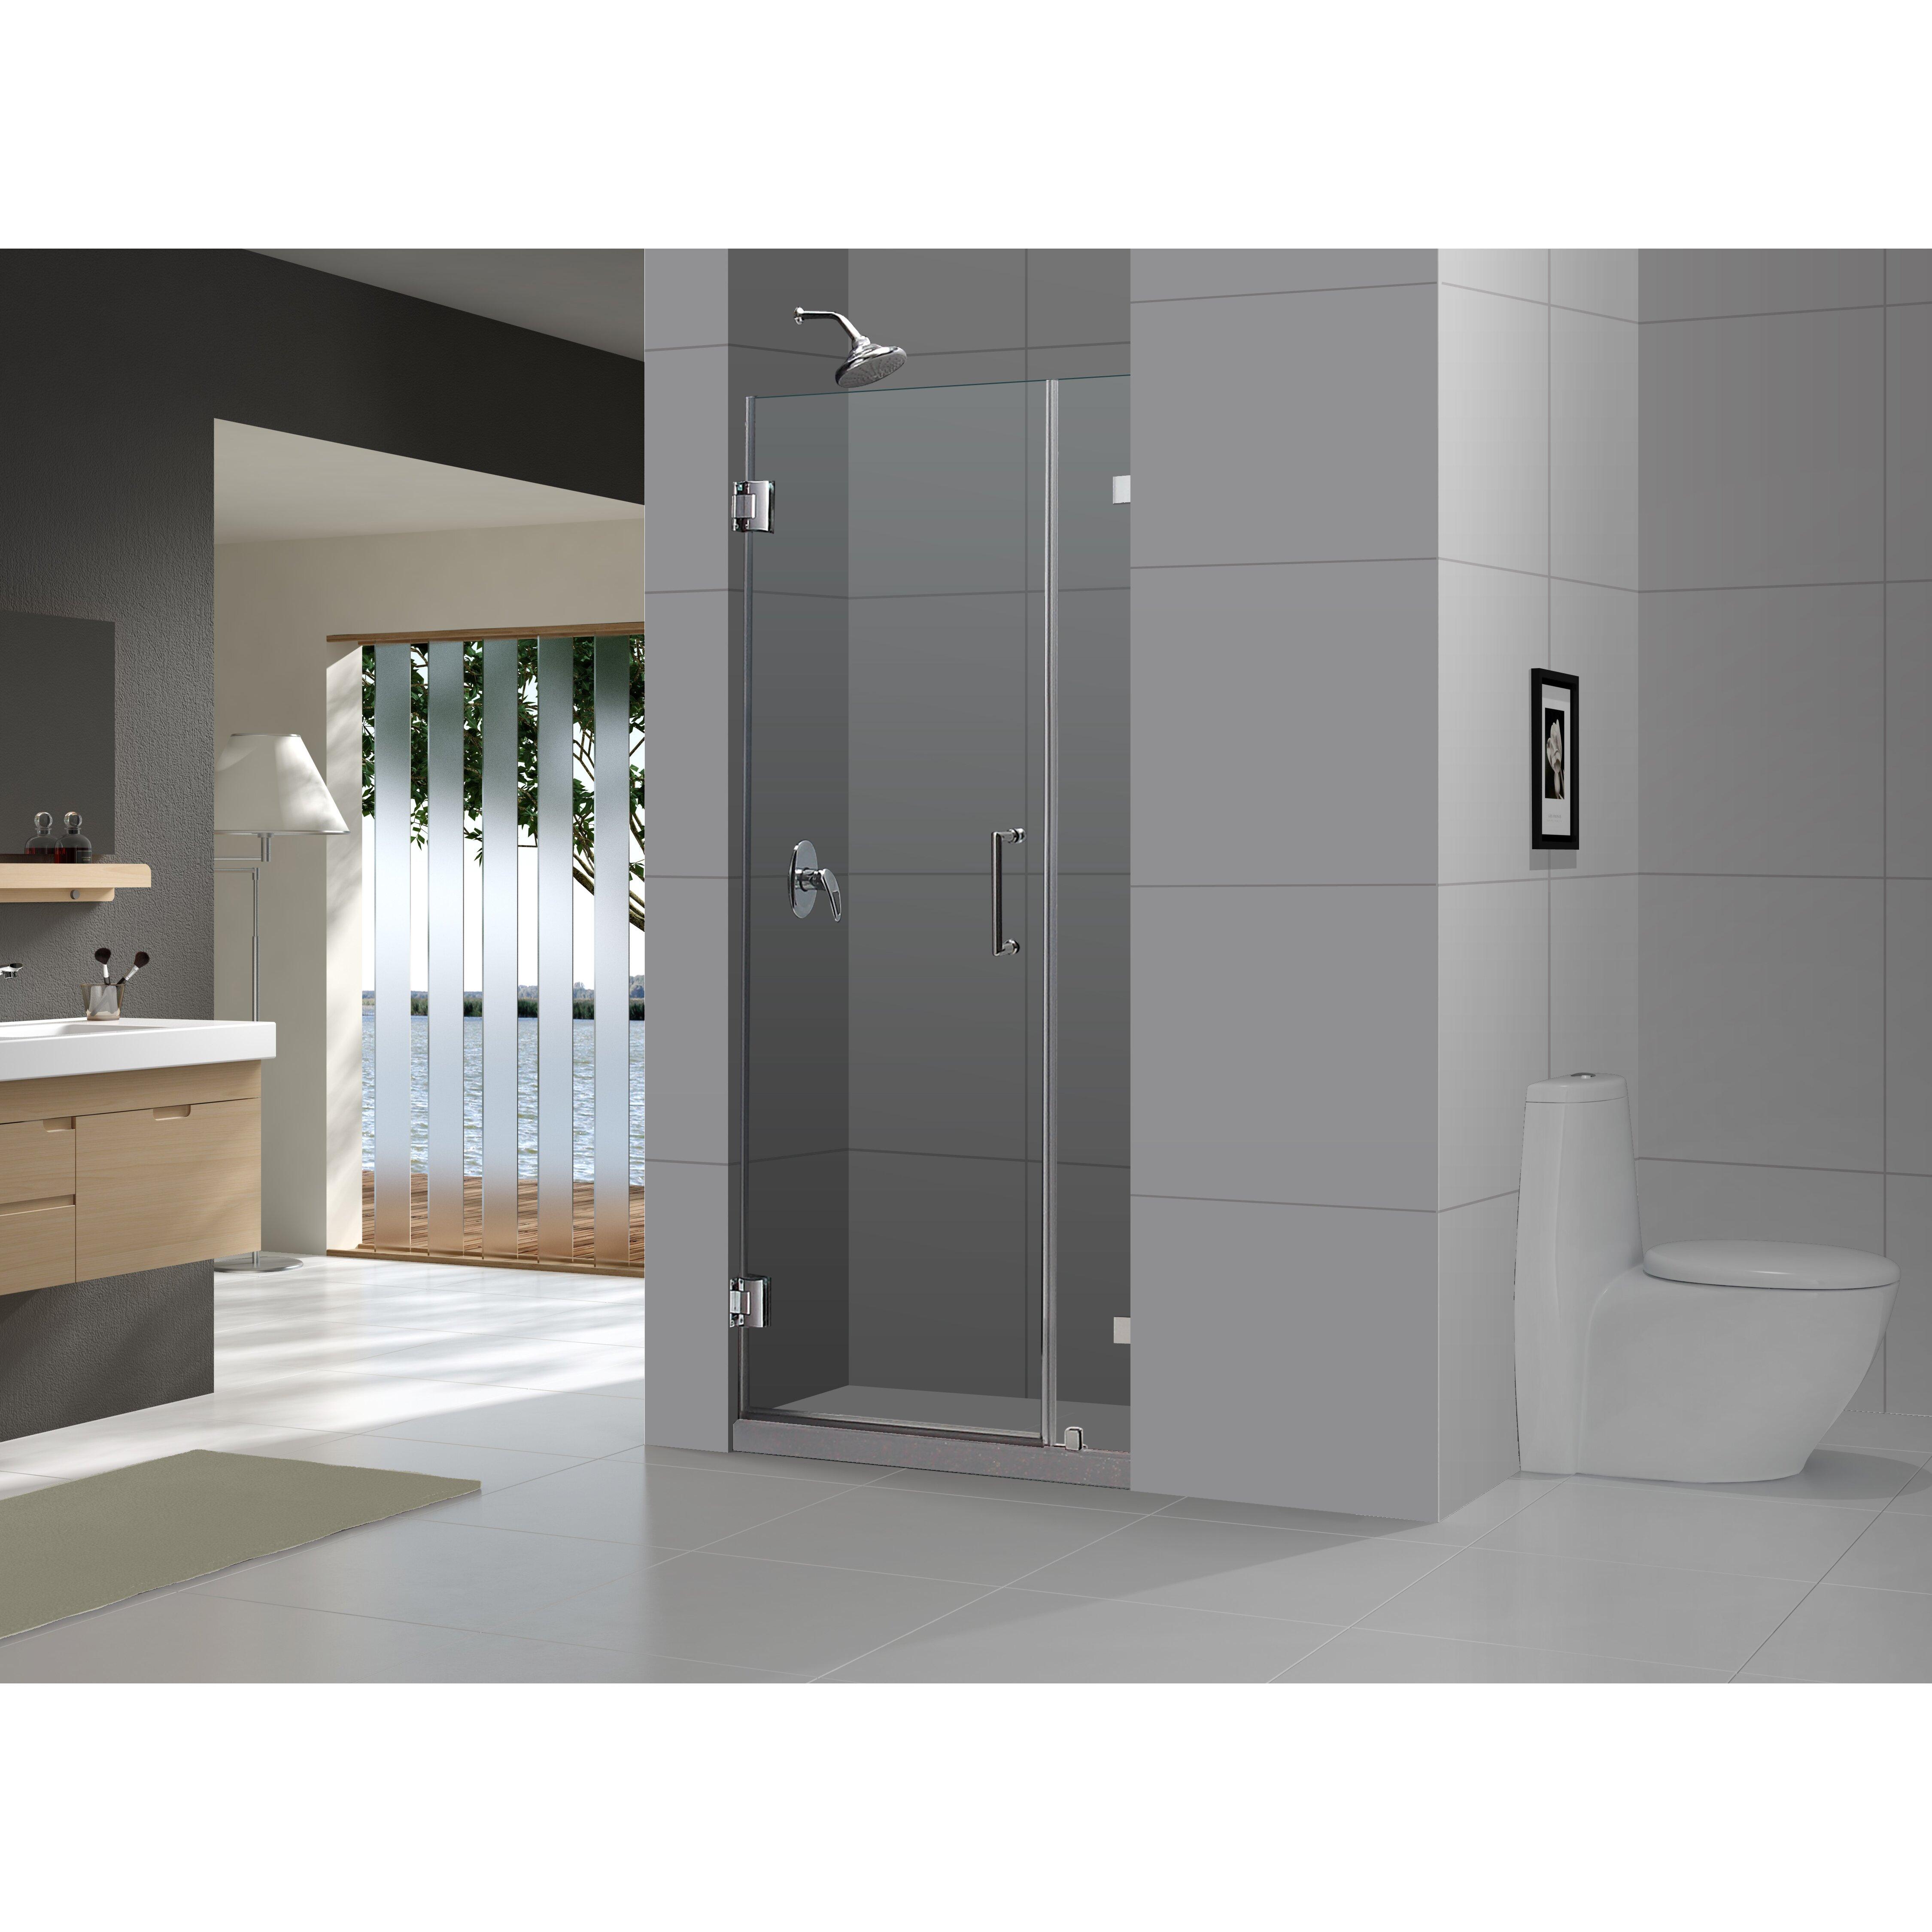 Dreamline Unidoor Lux 72 X 48 Pivot Frameless Hinged Shower